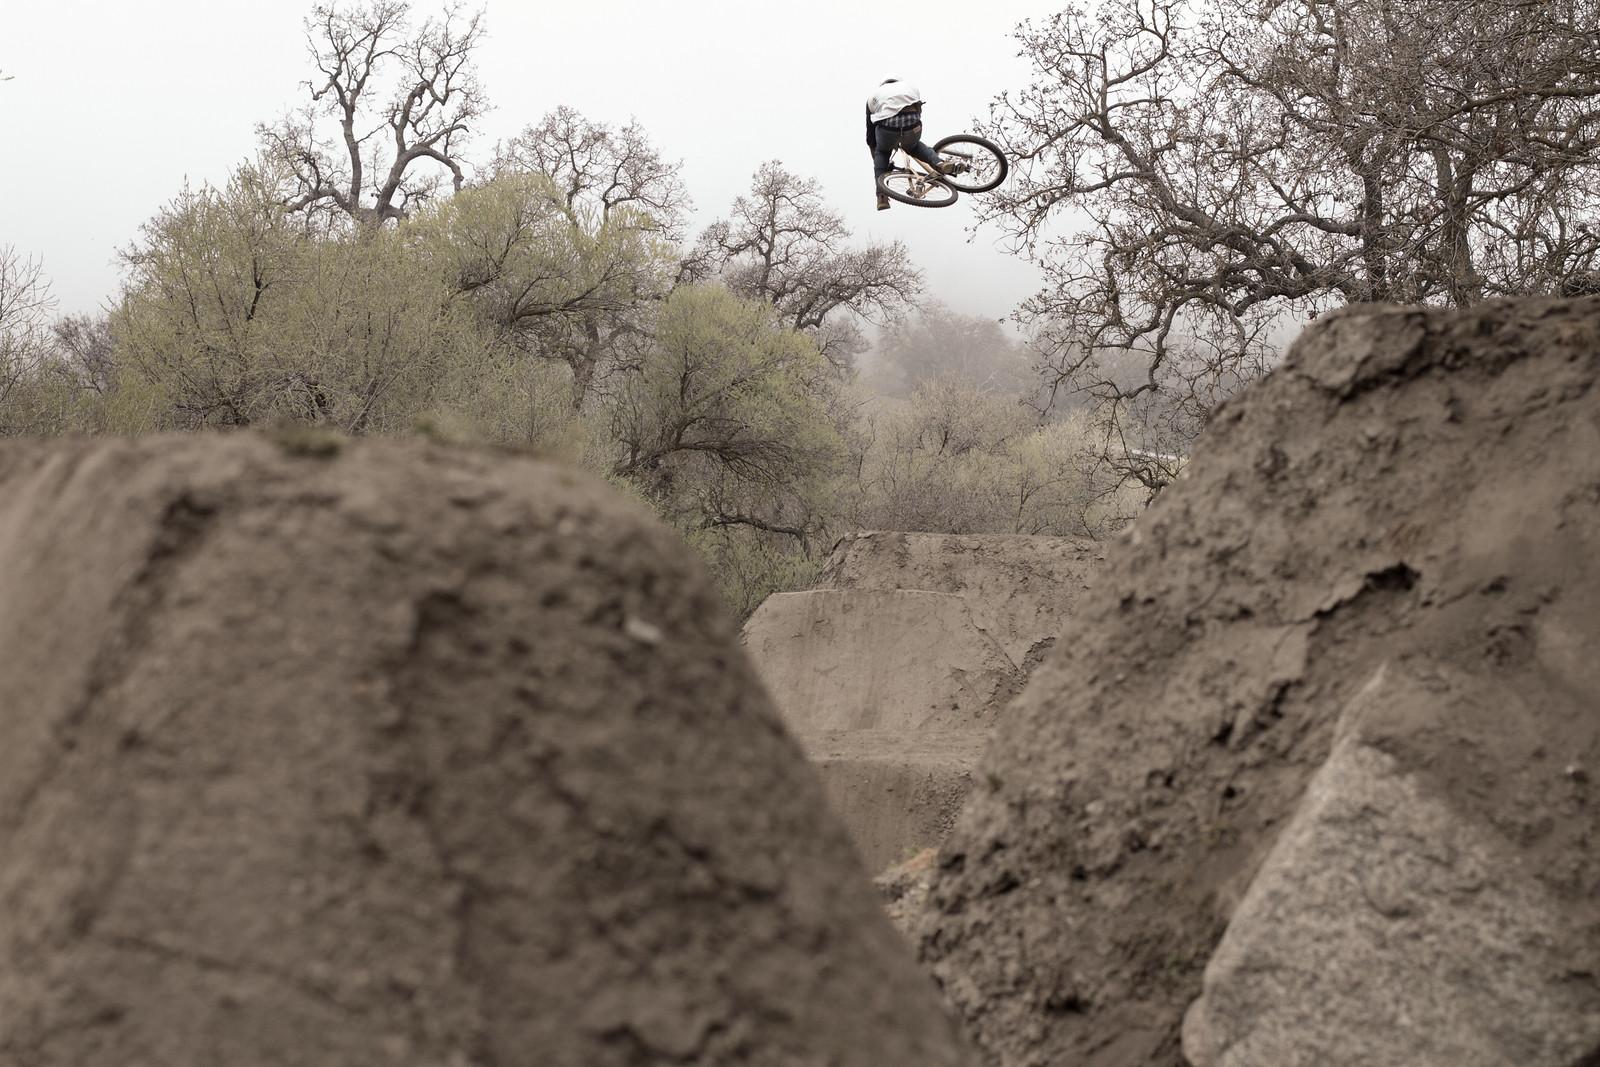 Ray George Super Session Blasting - corytepper.com - Mountain Biking Pictures - Vital MTB